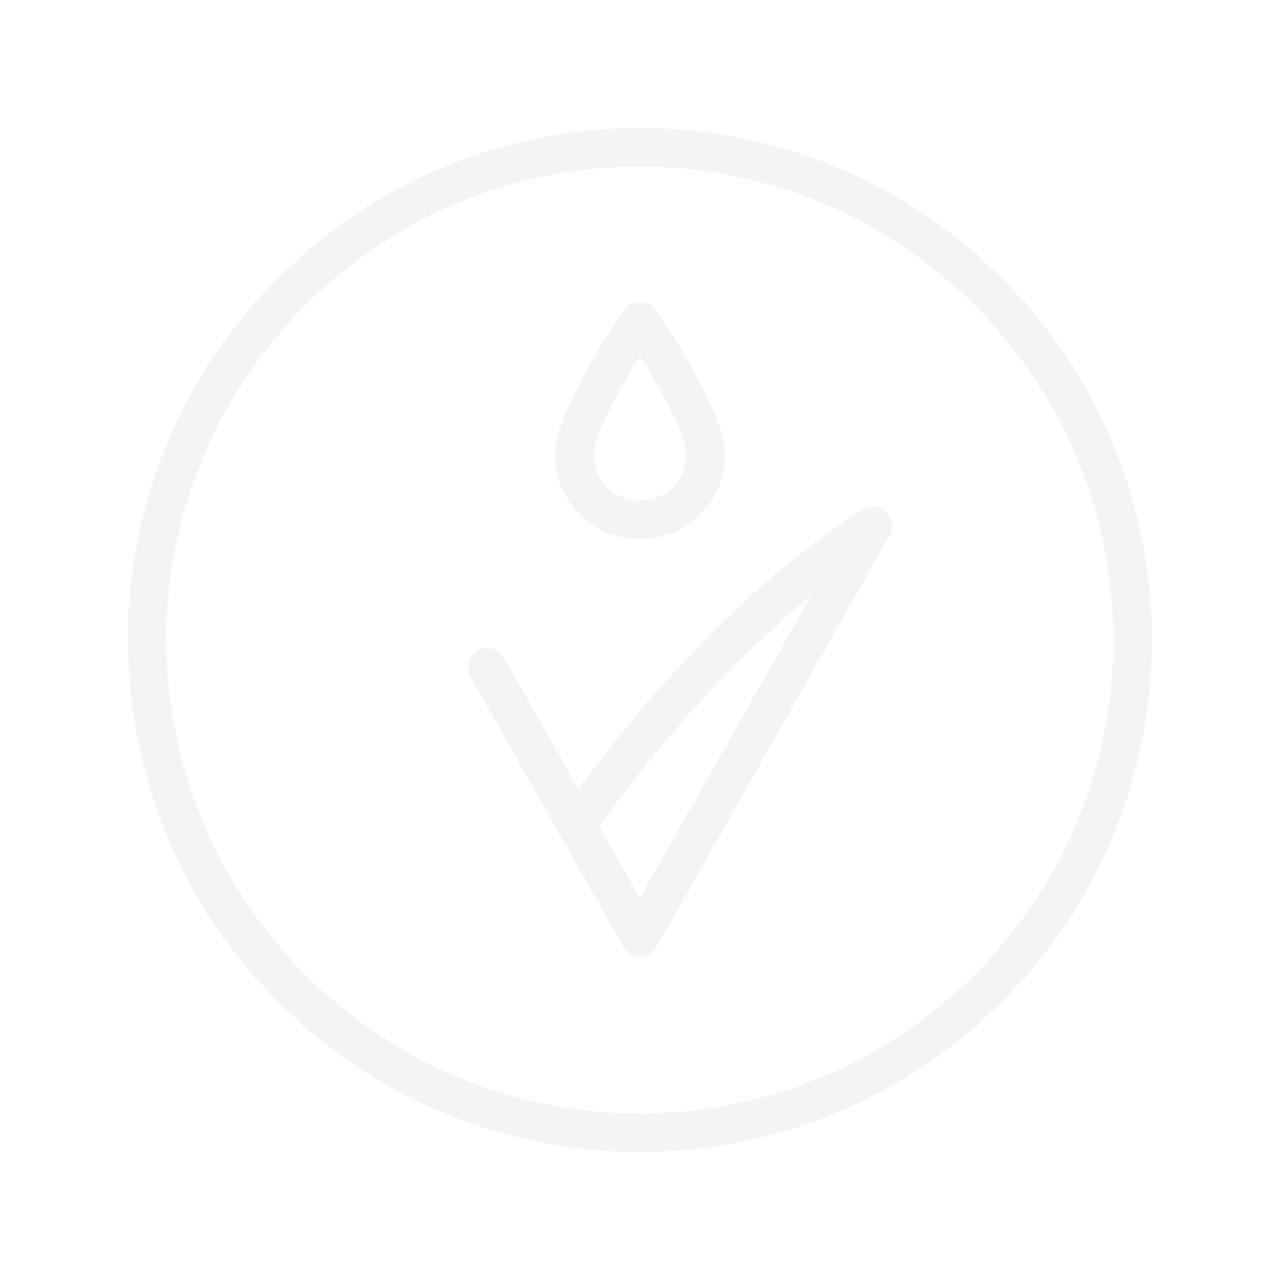 MAYBELLINE Fit Me Matte+Poreless Powder No.220 Natural Beige 14g